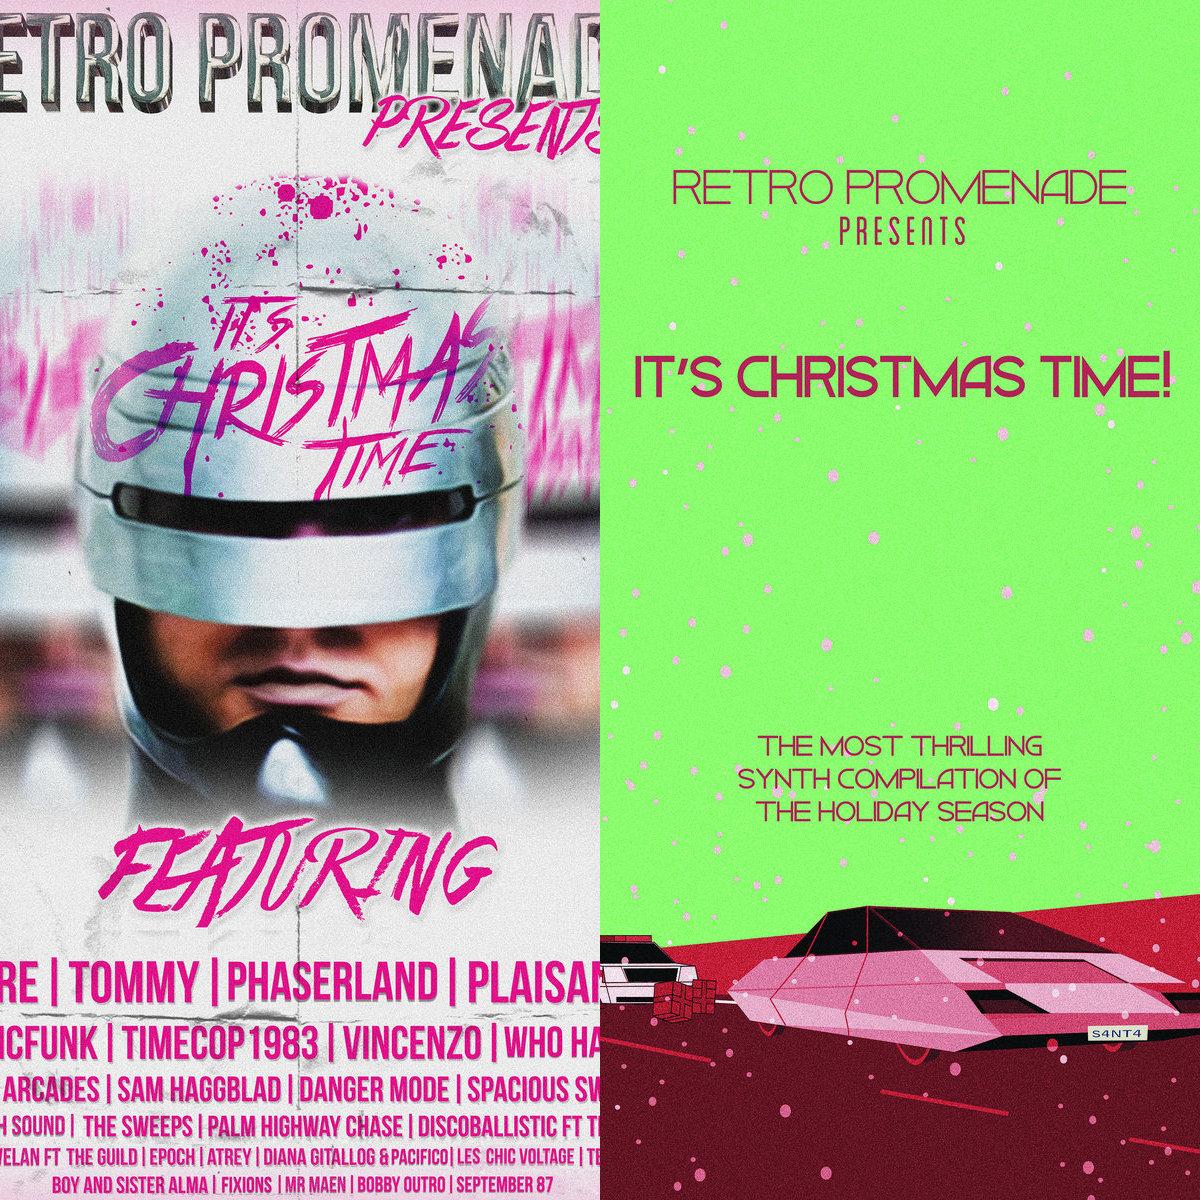 It's Christmas Time! | Retro Promenade